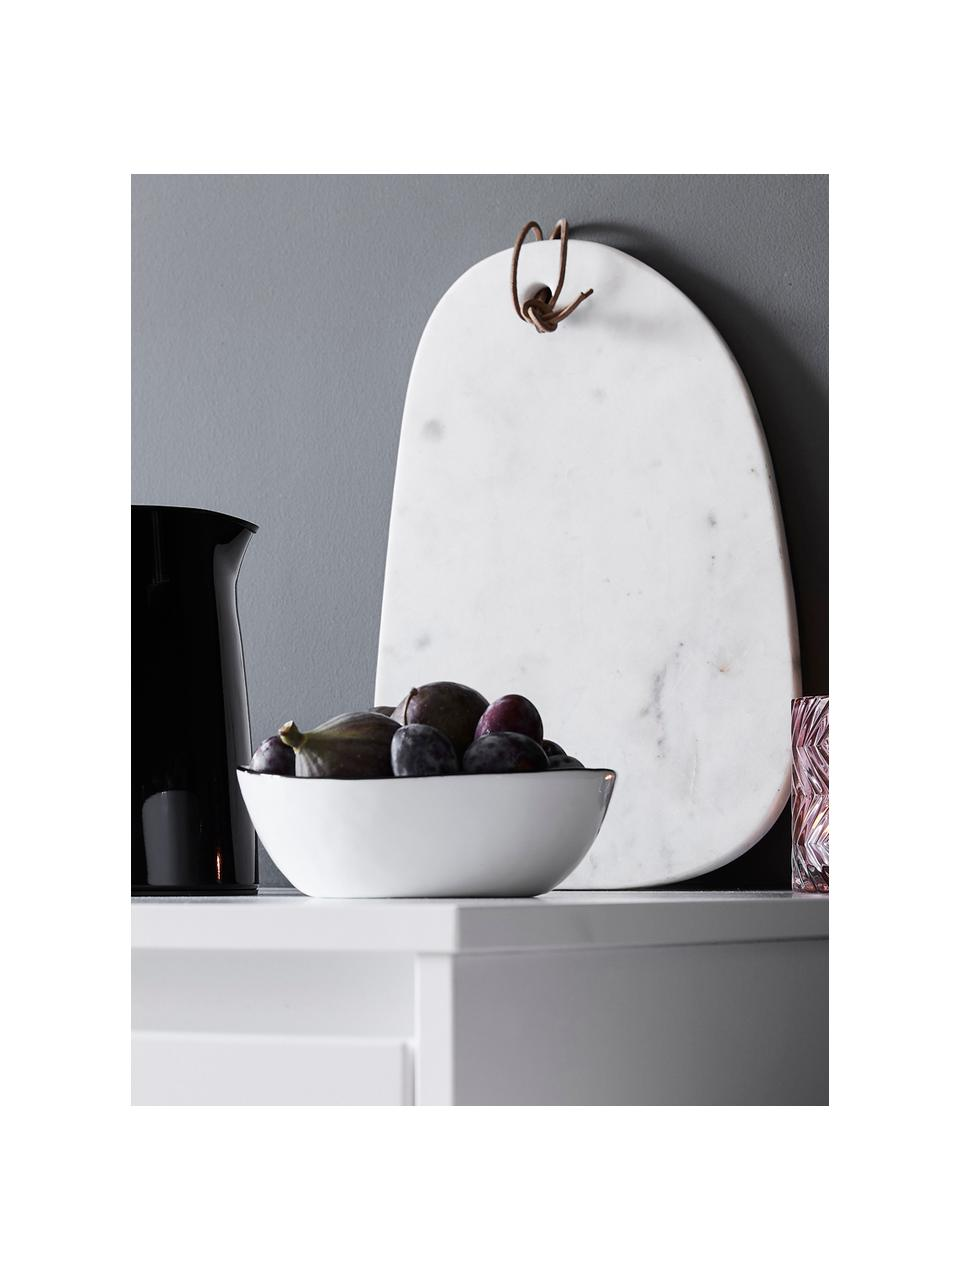 Deska do krojenia z marmuru Classic, Biały, marmurowy, S 24 x D 35 cm